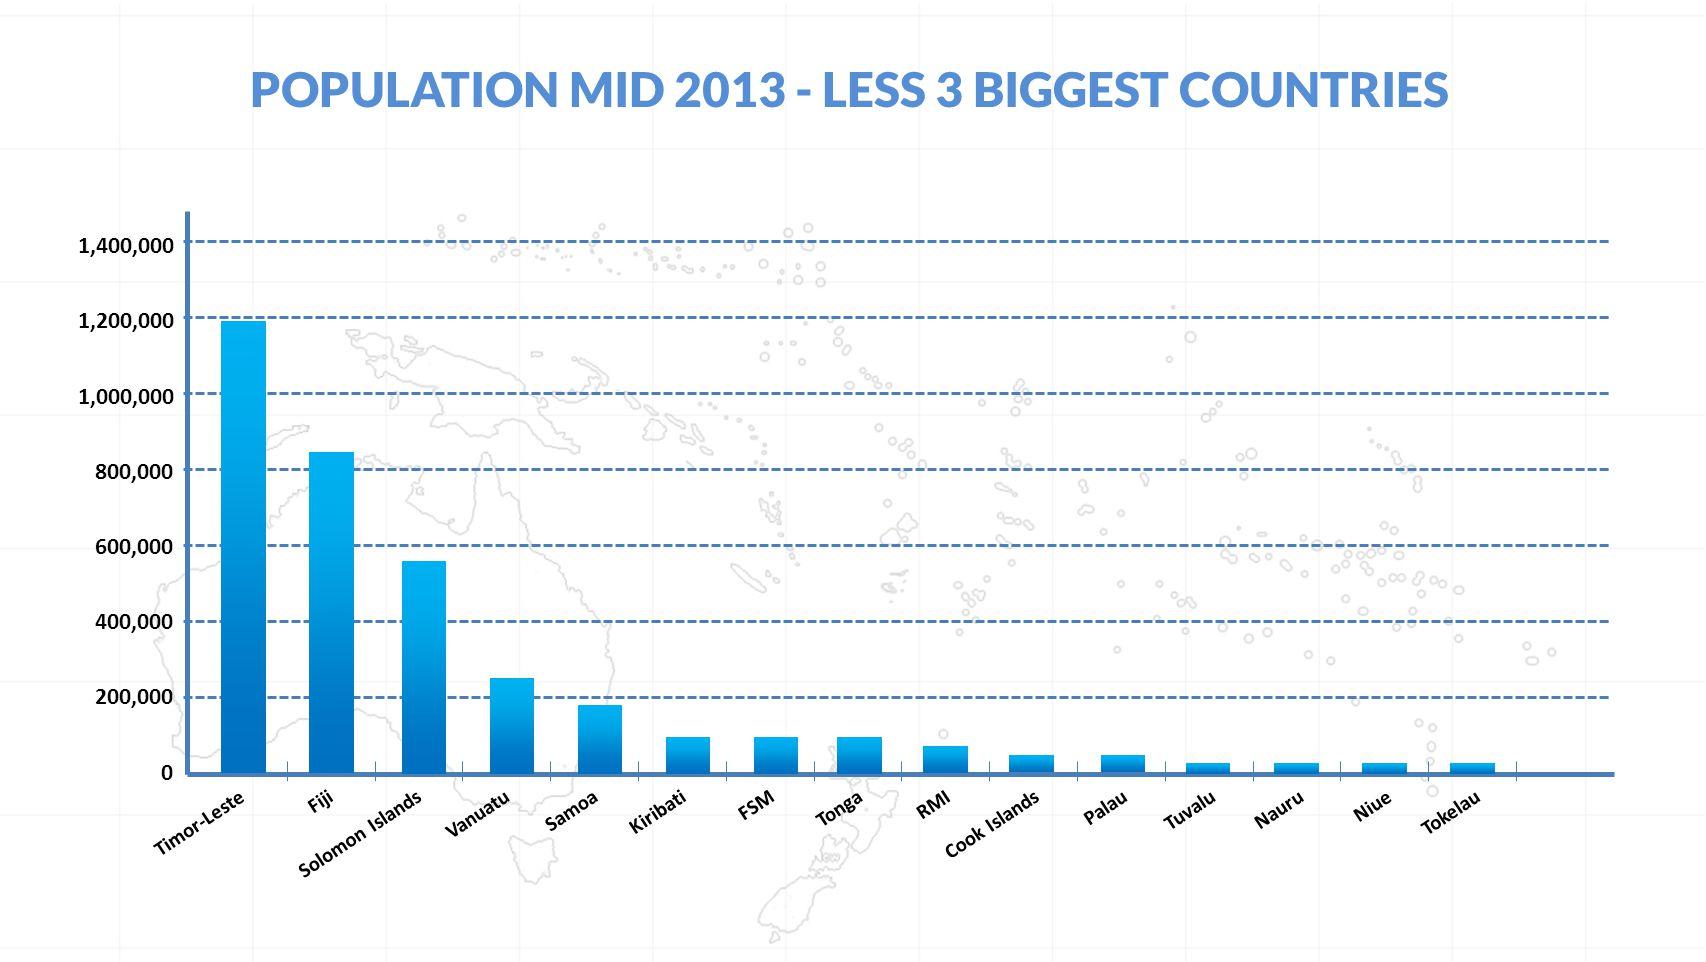 POPULATION MID 2013 - LESS 3 BIGGEST COUNTRIES Timor-LesteFijiSolomon IslandsVanuatuSamoaKiribatiFSMTongaRMICook IslandsPalauTuvaluNauruNiueTokelau 0 1,000,000 800,000 600,000 400,000 200,000 1,200,000 1,400,000